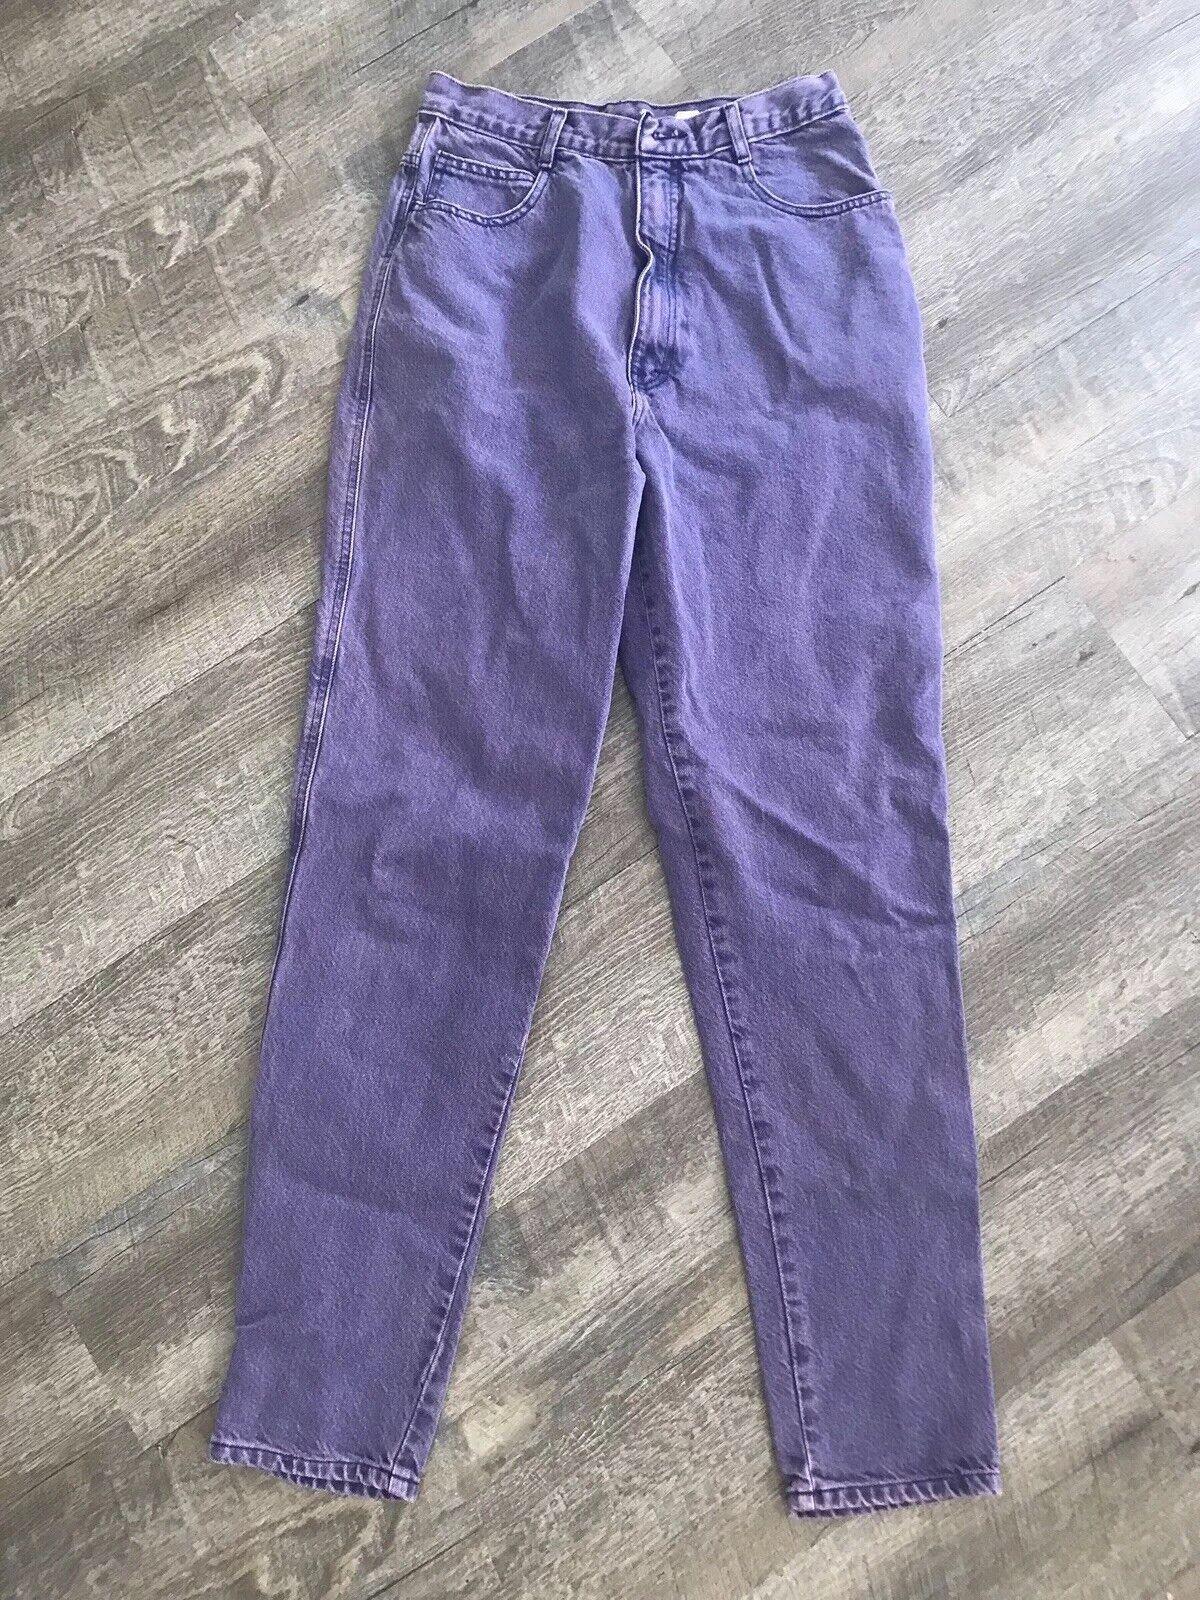 Vintage 80s Oscar De La Renta High Waisted Mom Jeans lila Denim Größe 12